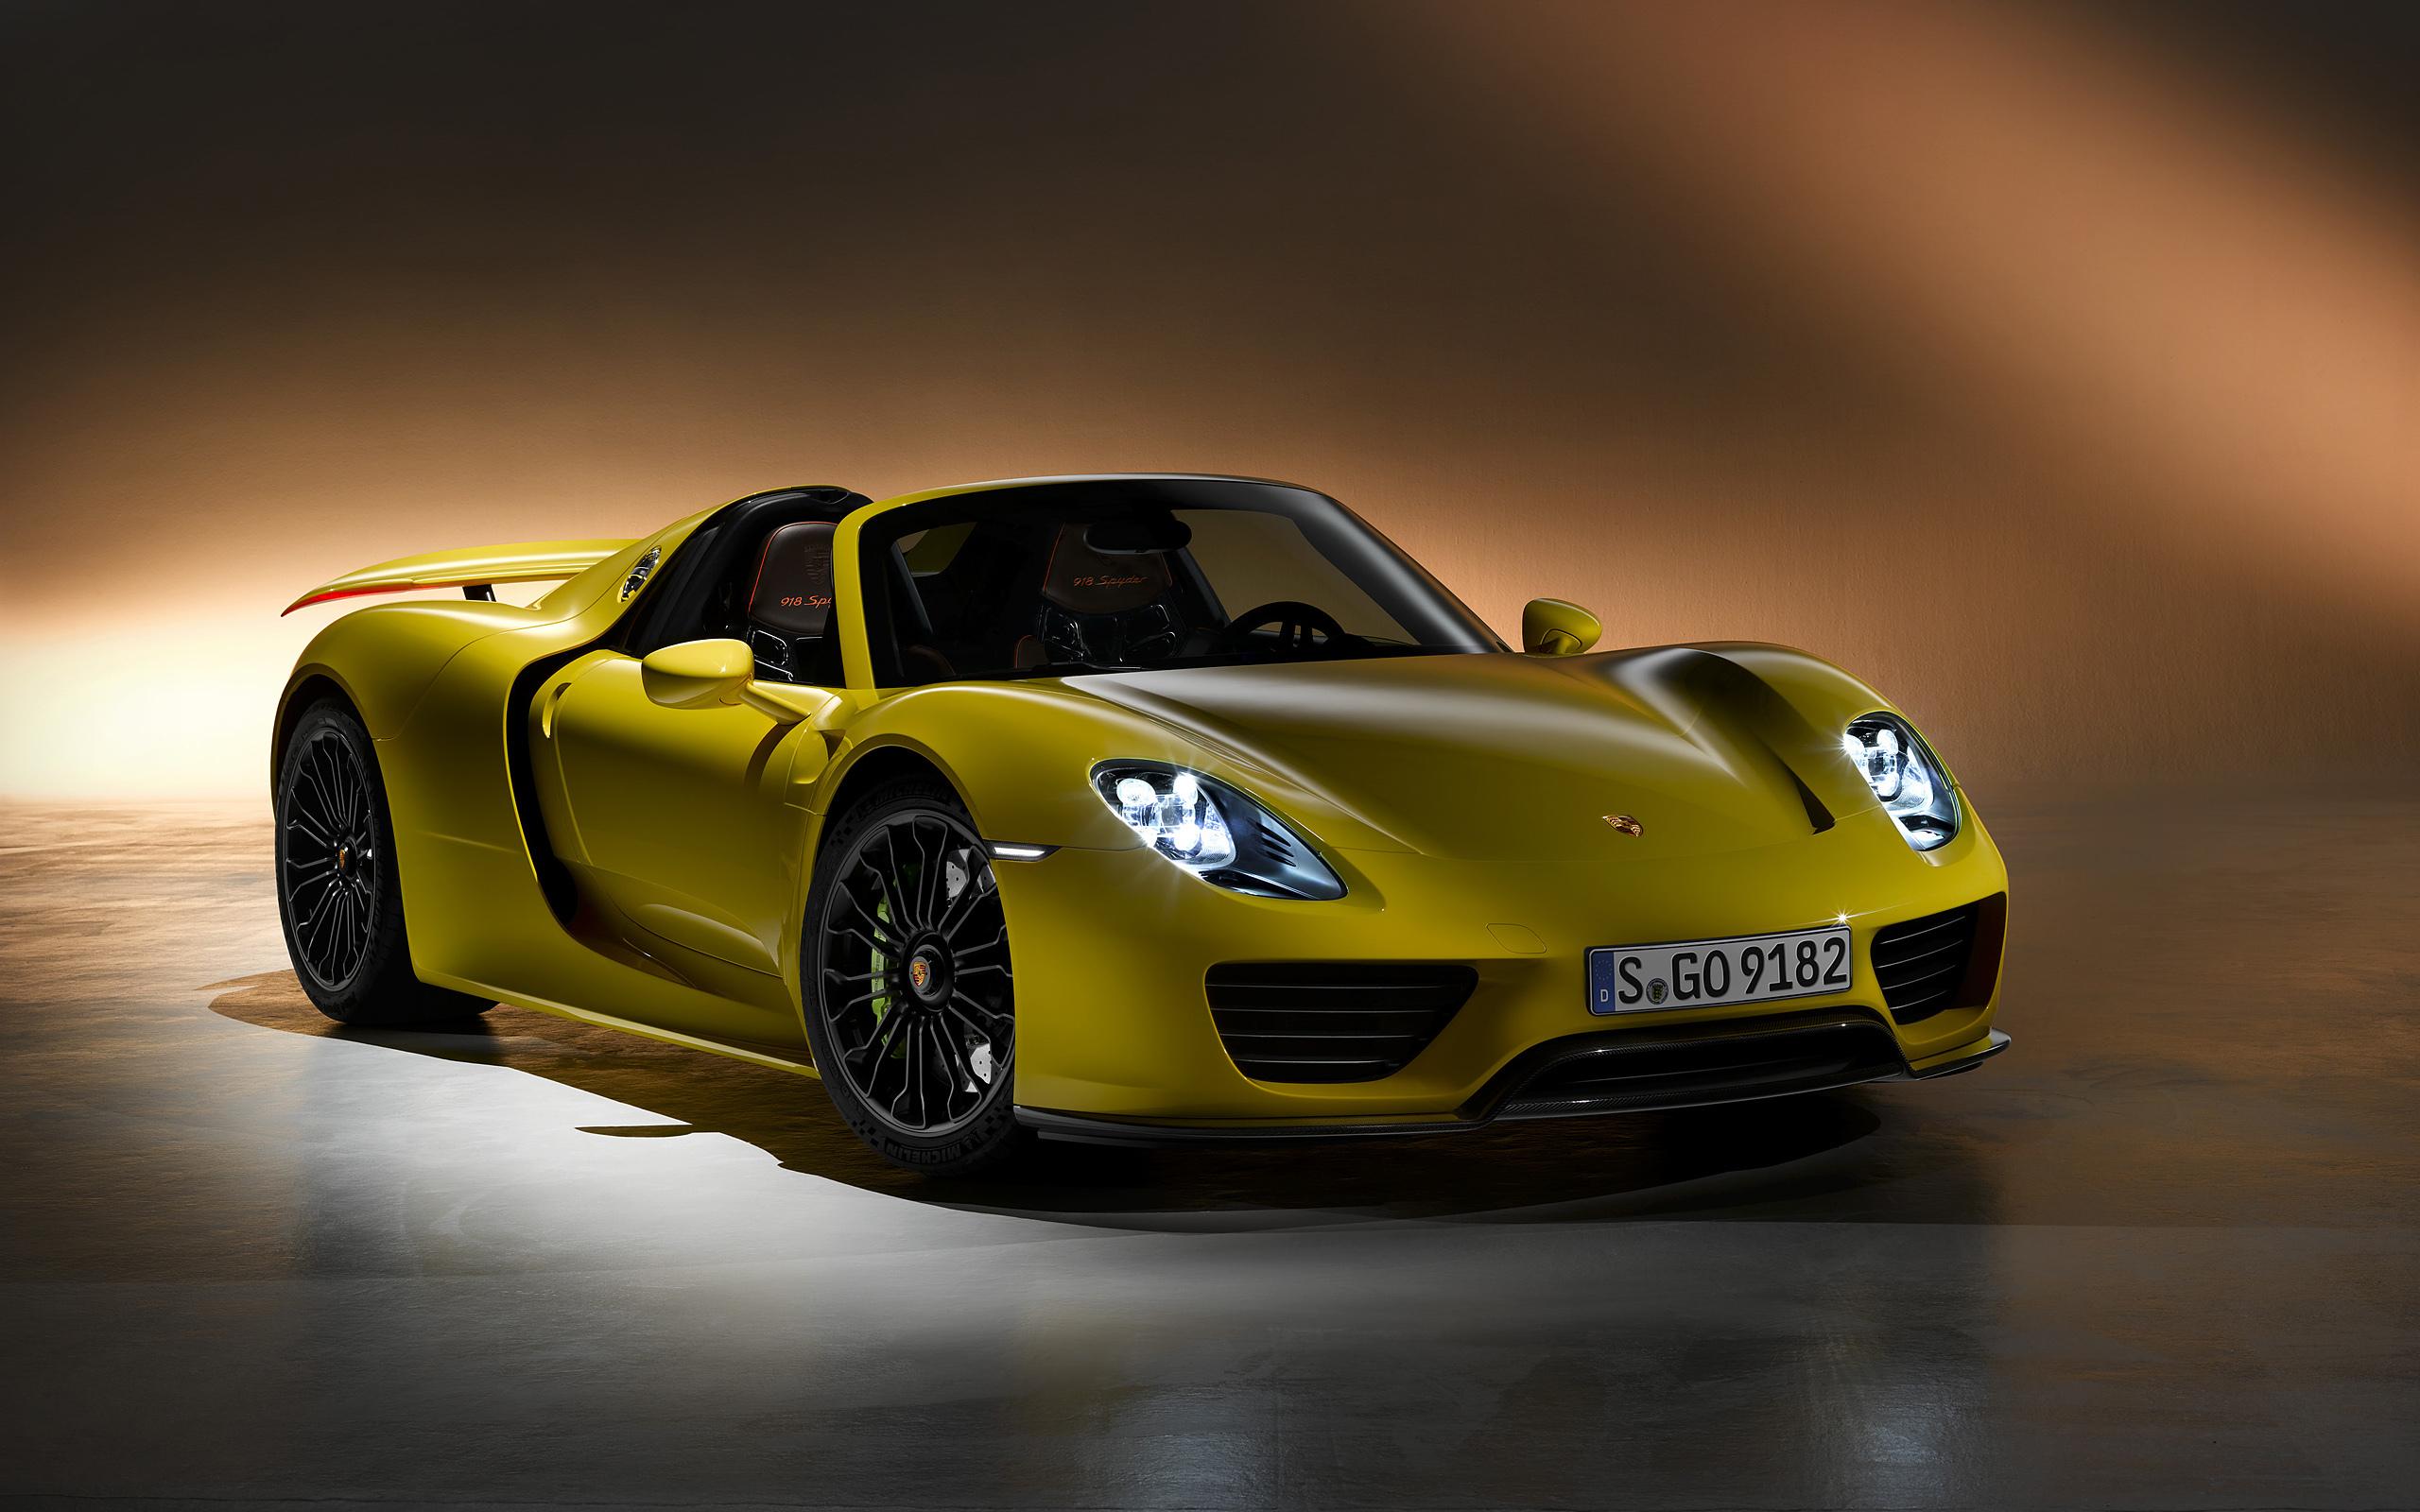 car-vehicle-yellow-Porsche-side-view-sports-car-performance-car-Spyder-supercar-land-vehicle-automotive-design-automobile-make-luxury-vehicle-porsche-918-580196 Interesting Hinh Anh Xe Porsche 918 Spyder Cars Trend